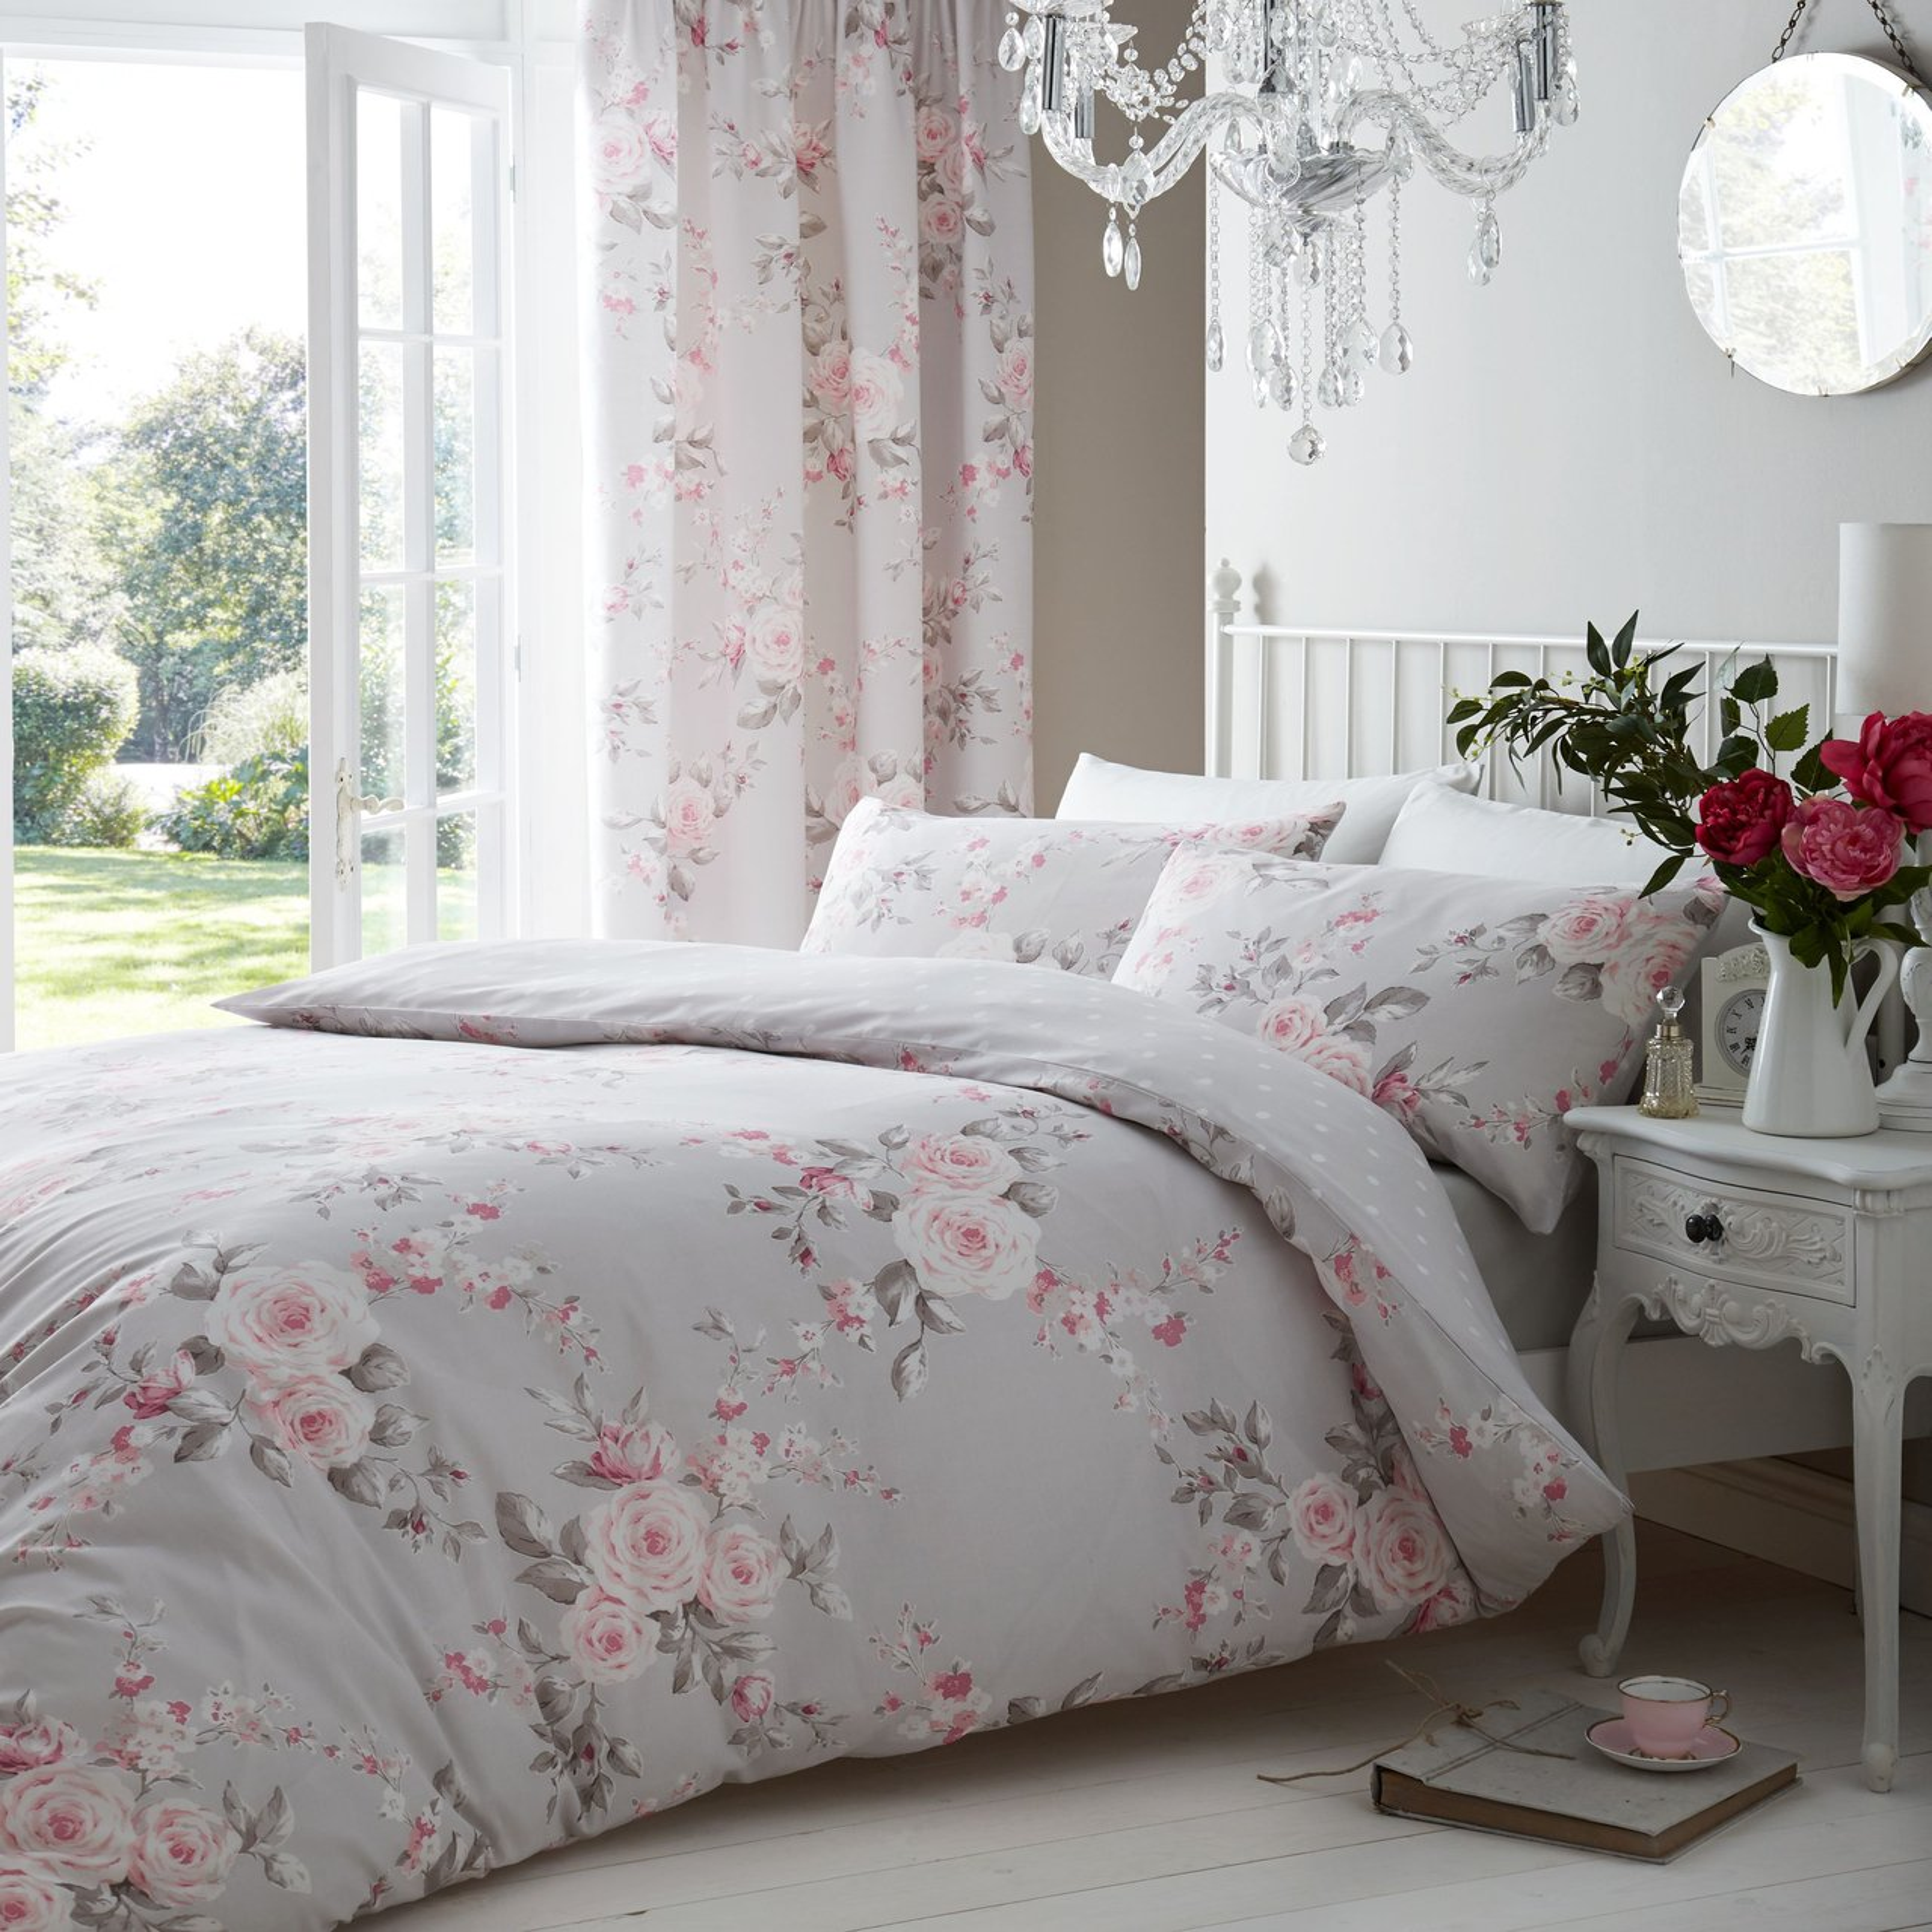 Image of Catherine Lansfield Canterbury Floral Bedding Set - Kingsize - Pink